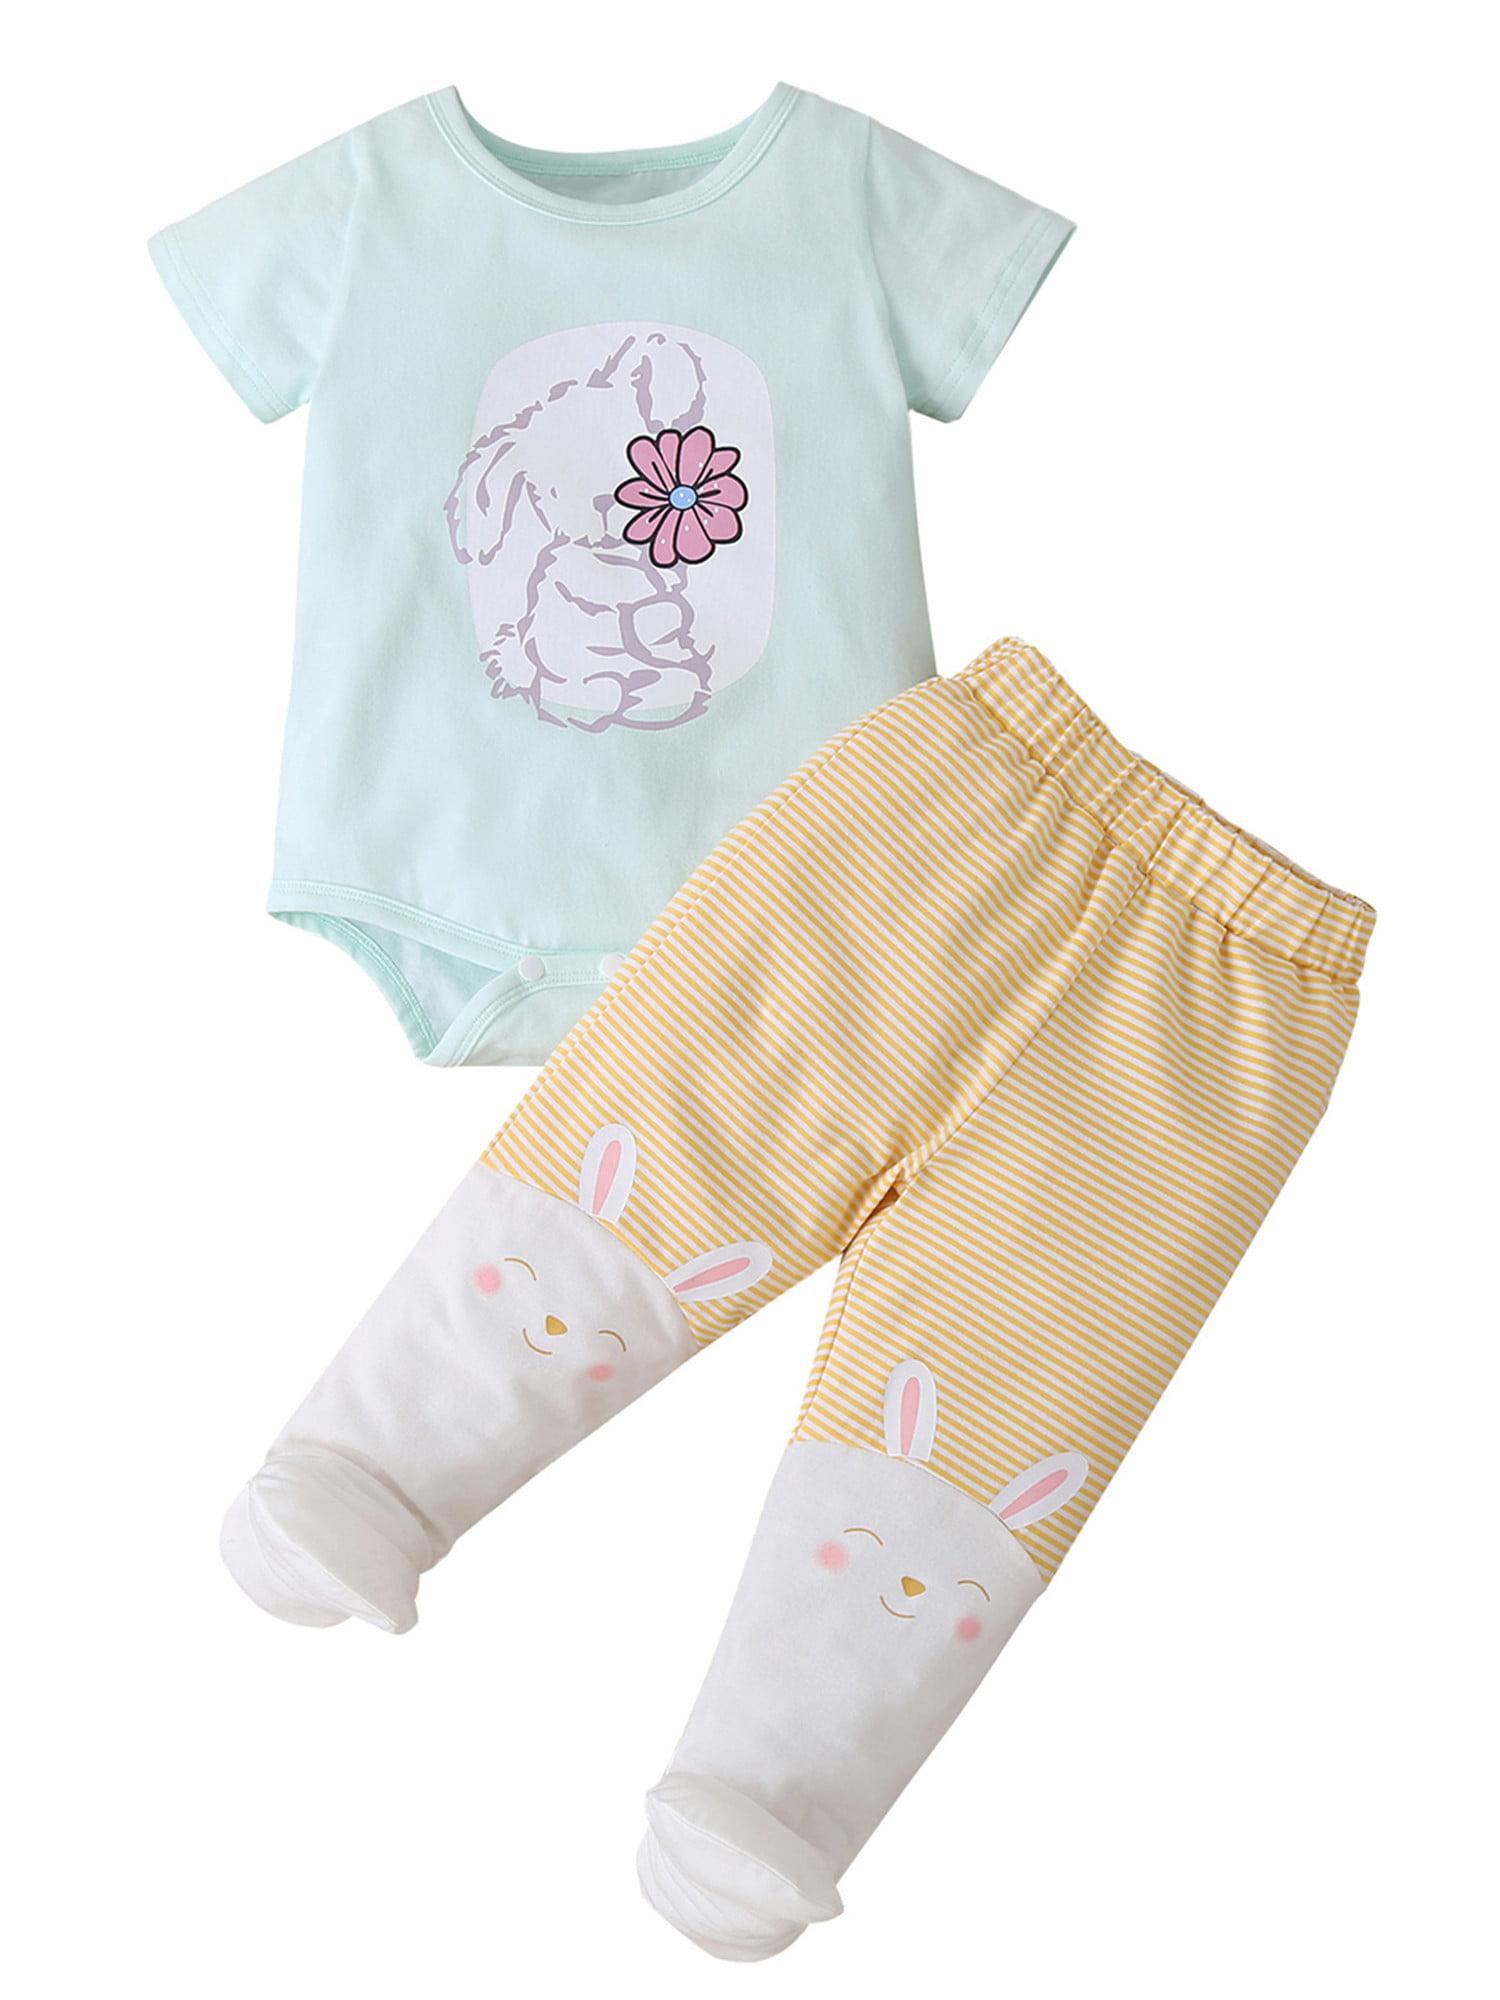 Details about  /2Pcs Toddler Newborn Infant Baby Boy Girl Romper Jumpsuit Tops Pants Outfits Set